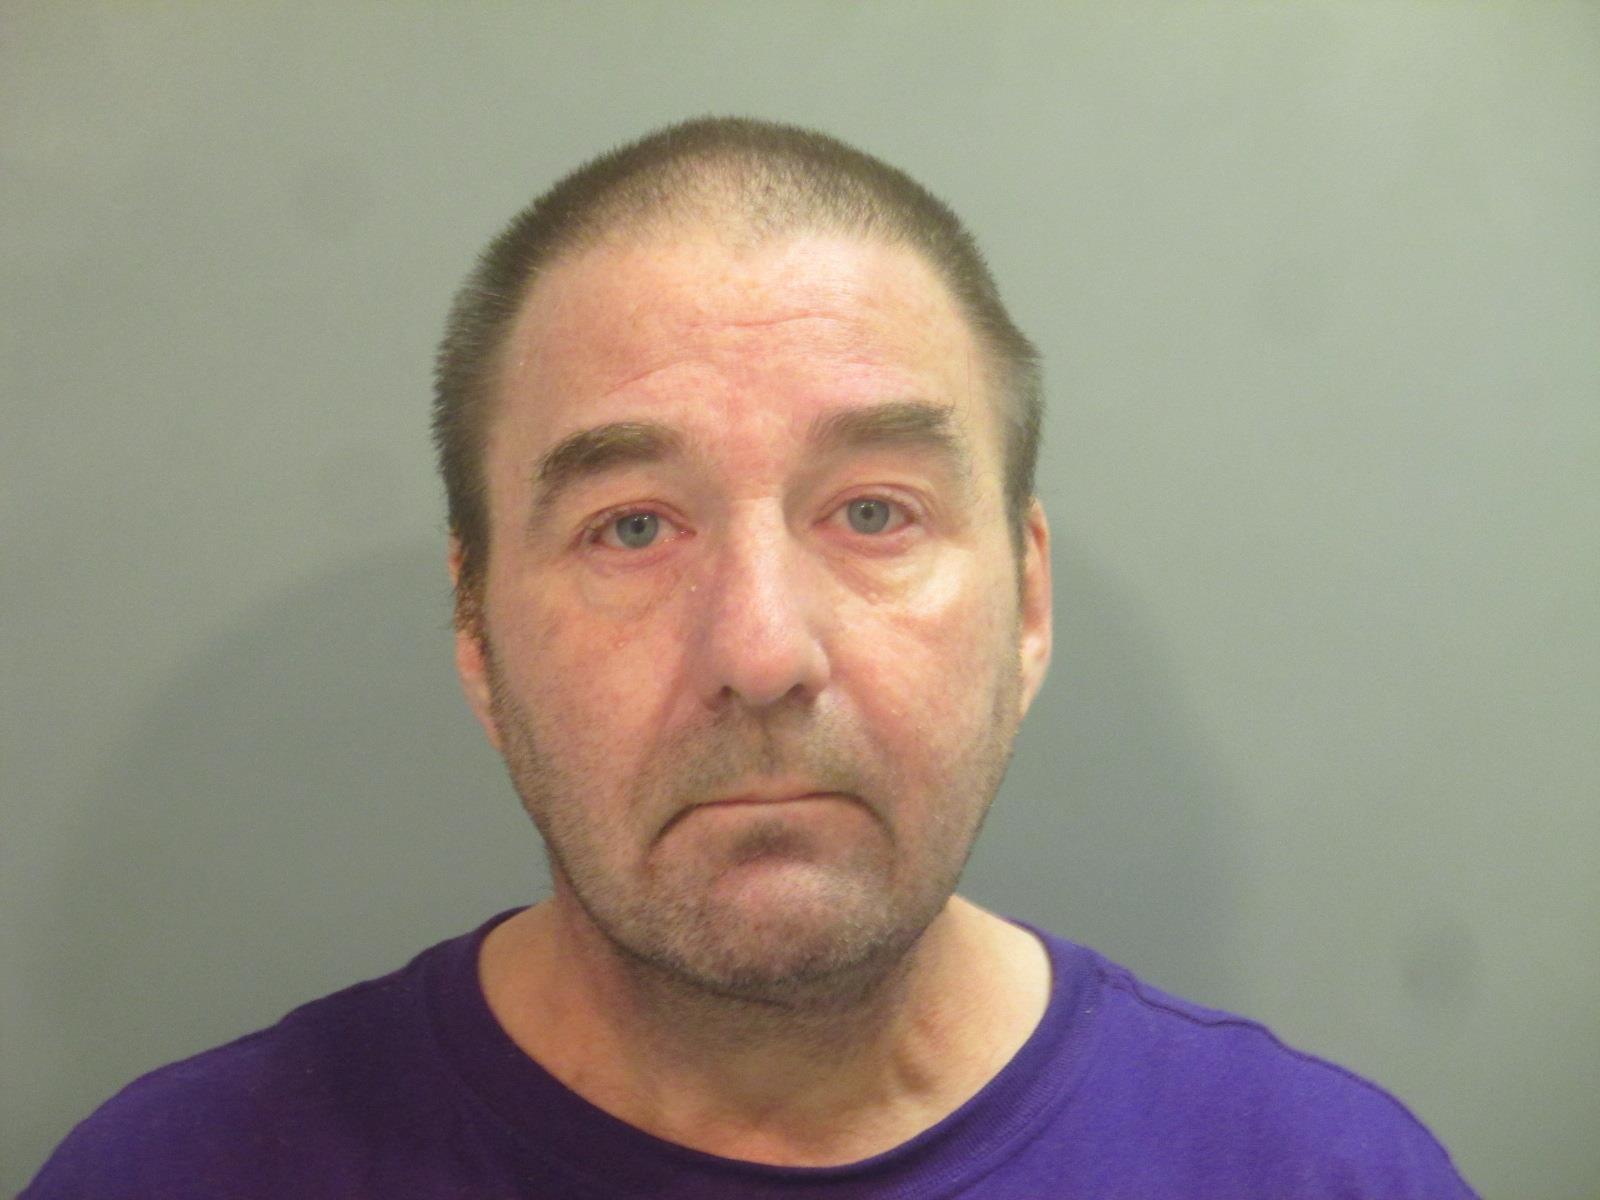 VA arrests former pathologist accused of working impaired